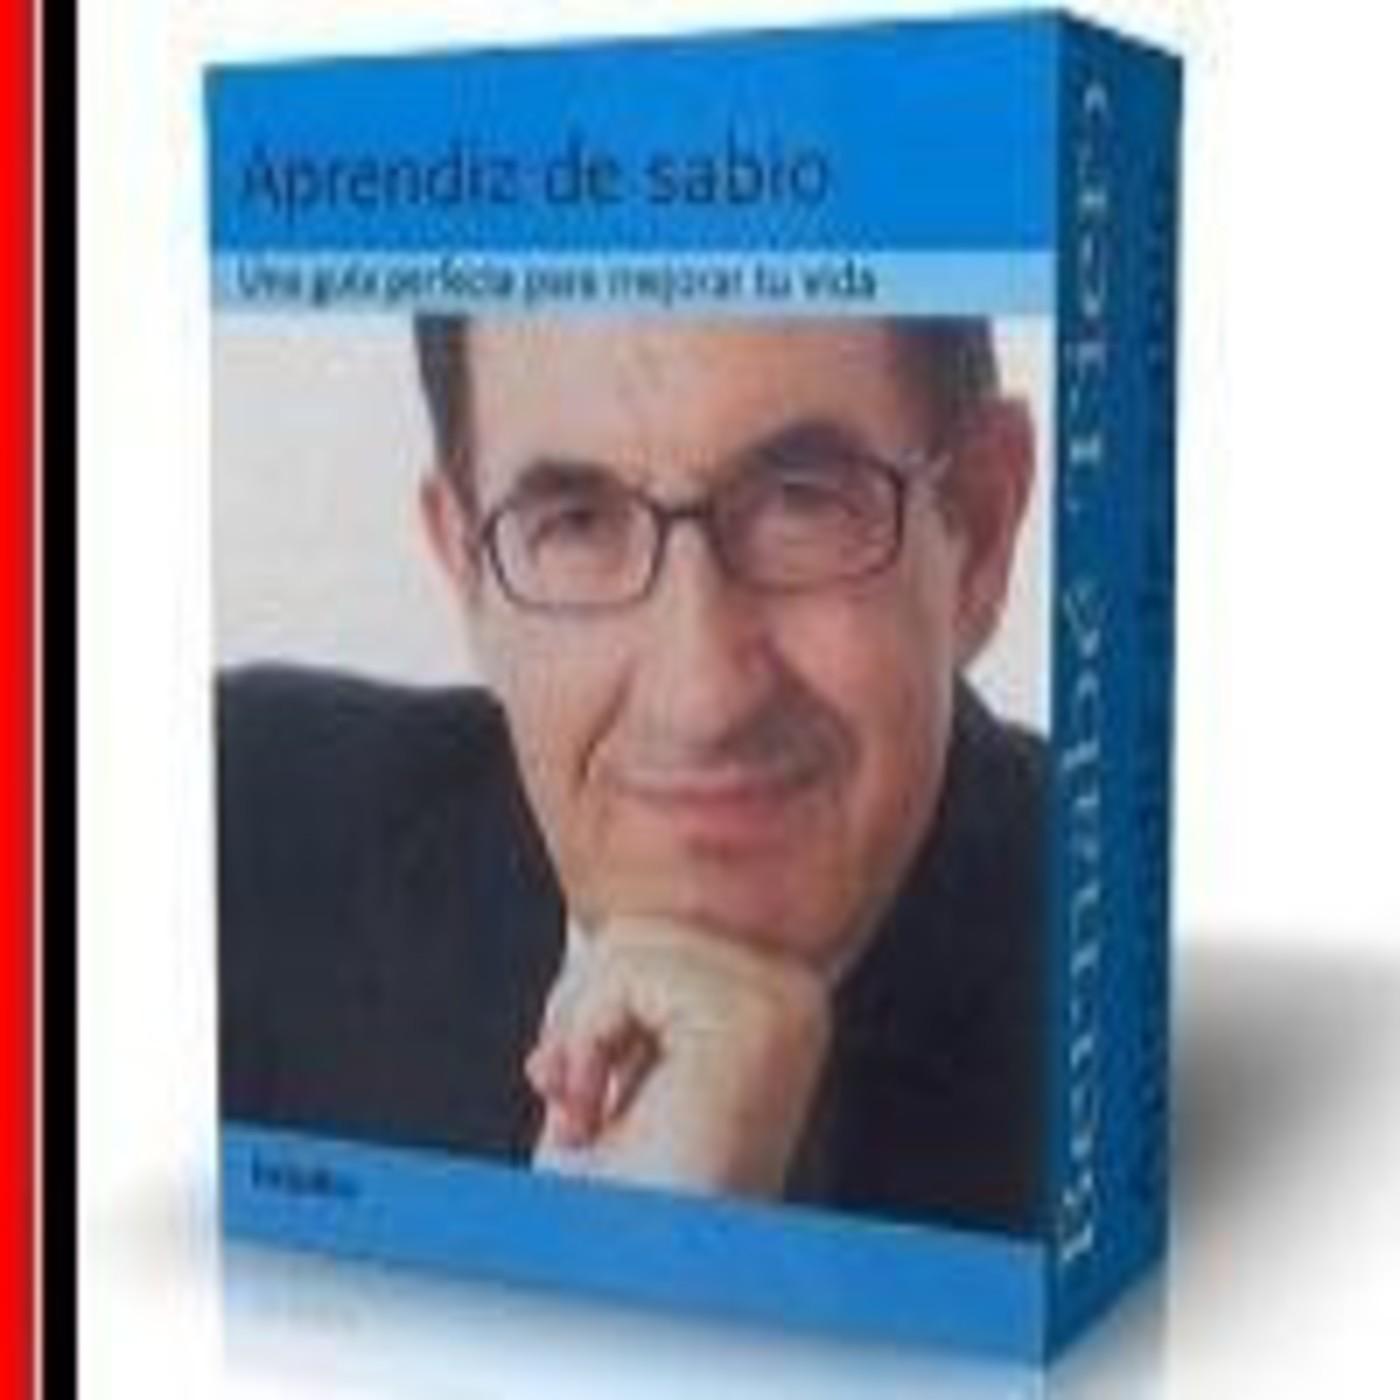 [01/04]Aprendiz de Sabio - Bernabé Tierno